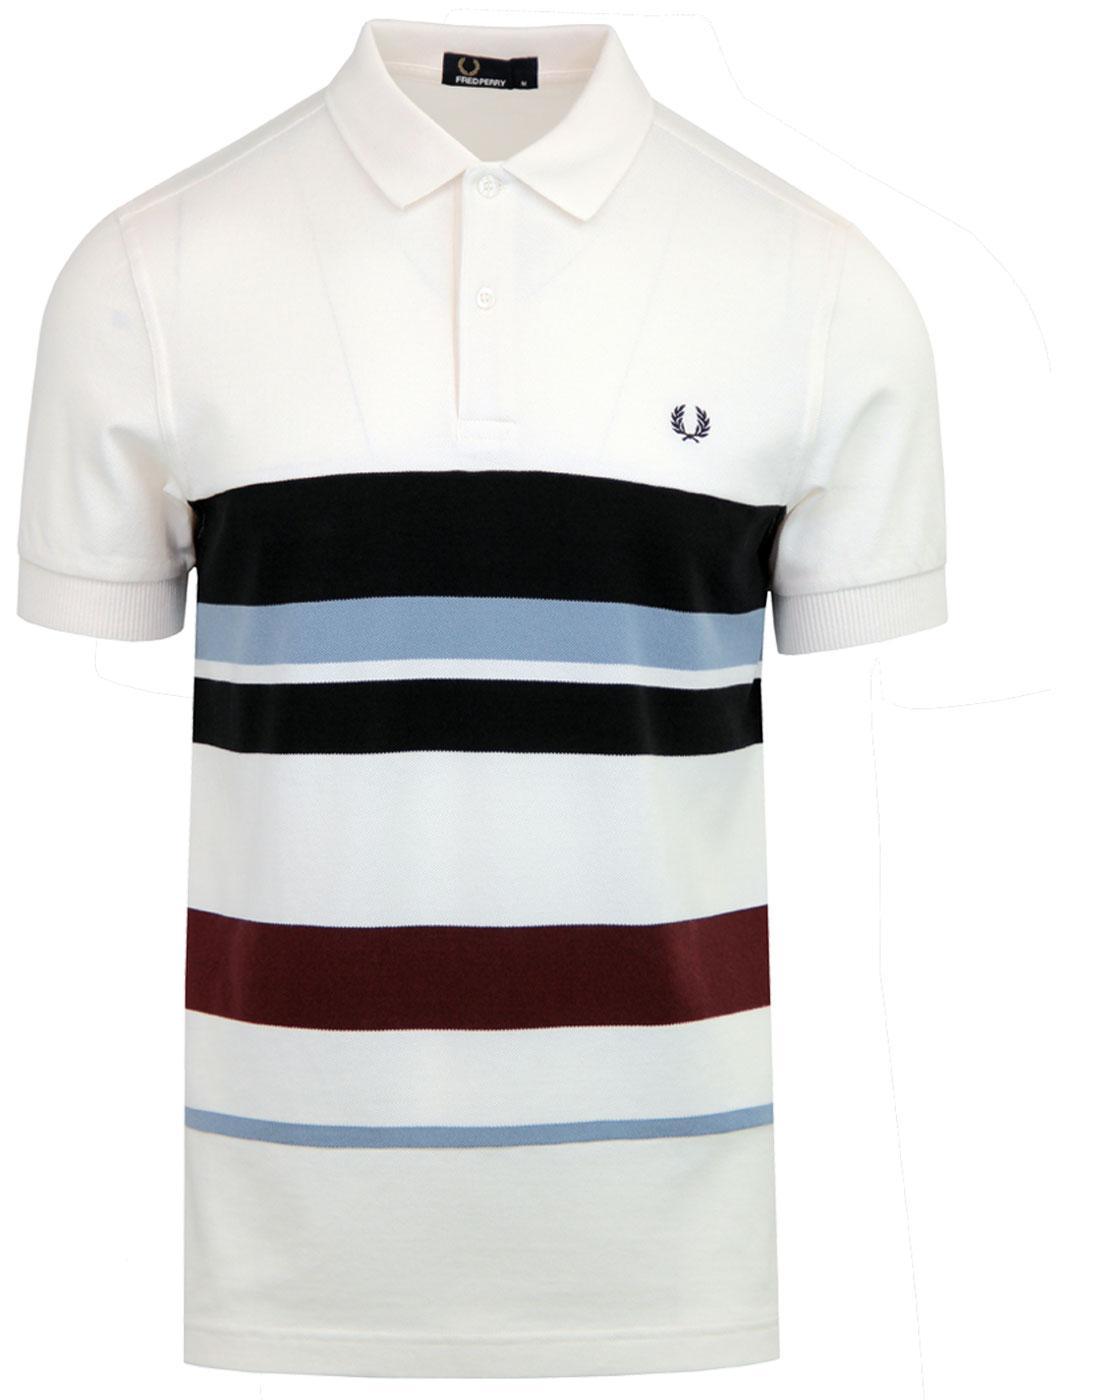 FRED PERRY Men's Mod Multi Stripe Pique Polo